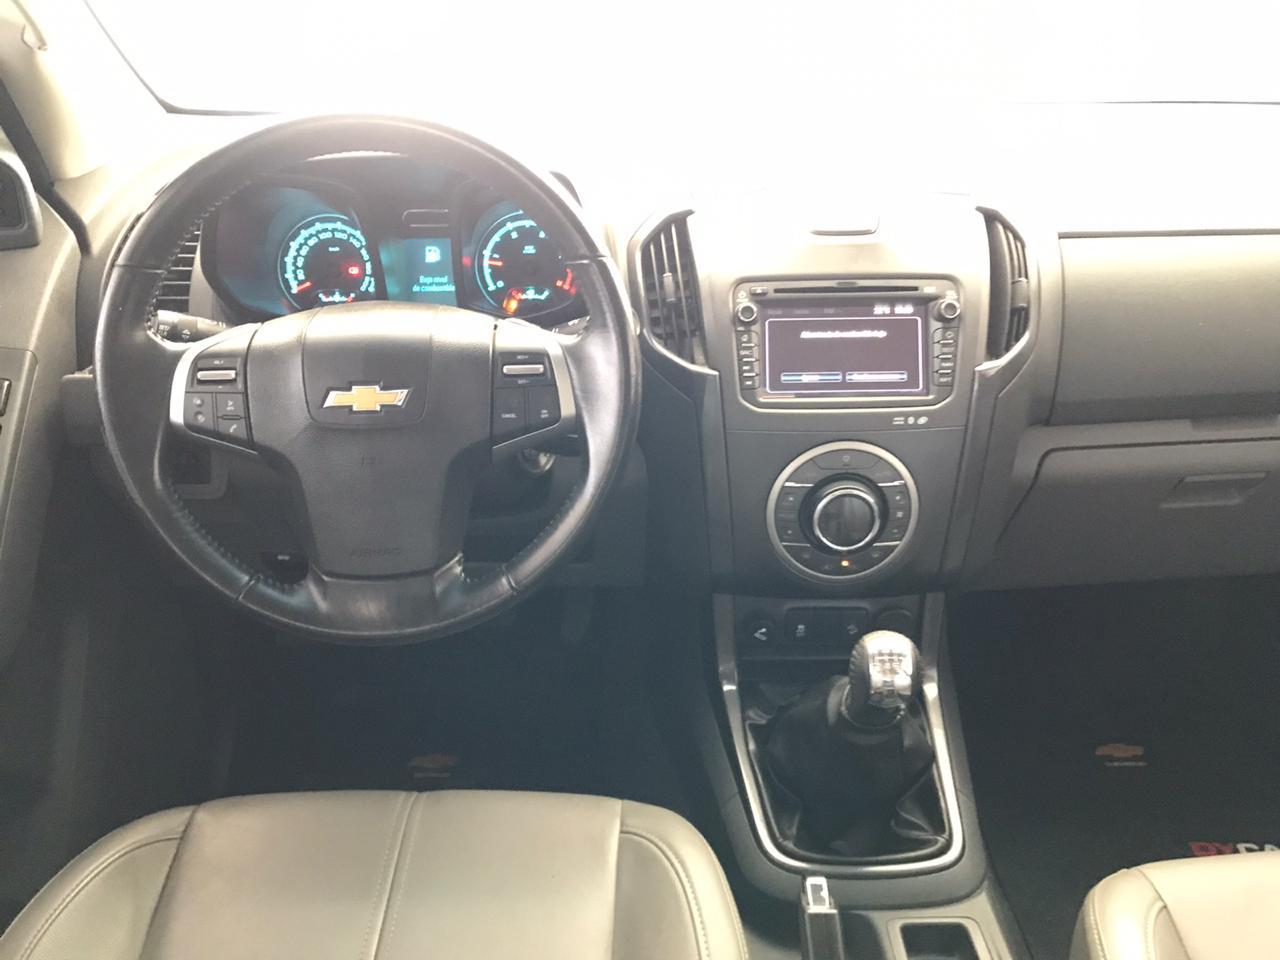 2014 CHEVROLET S10 LTZ 2,8L